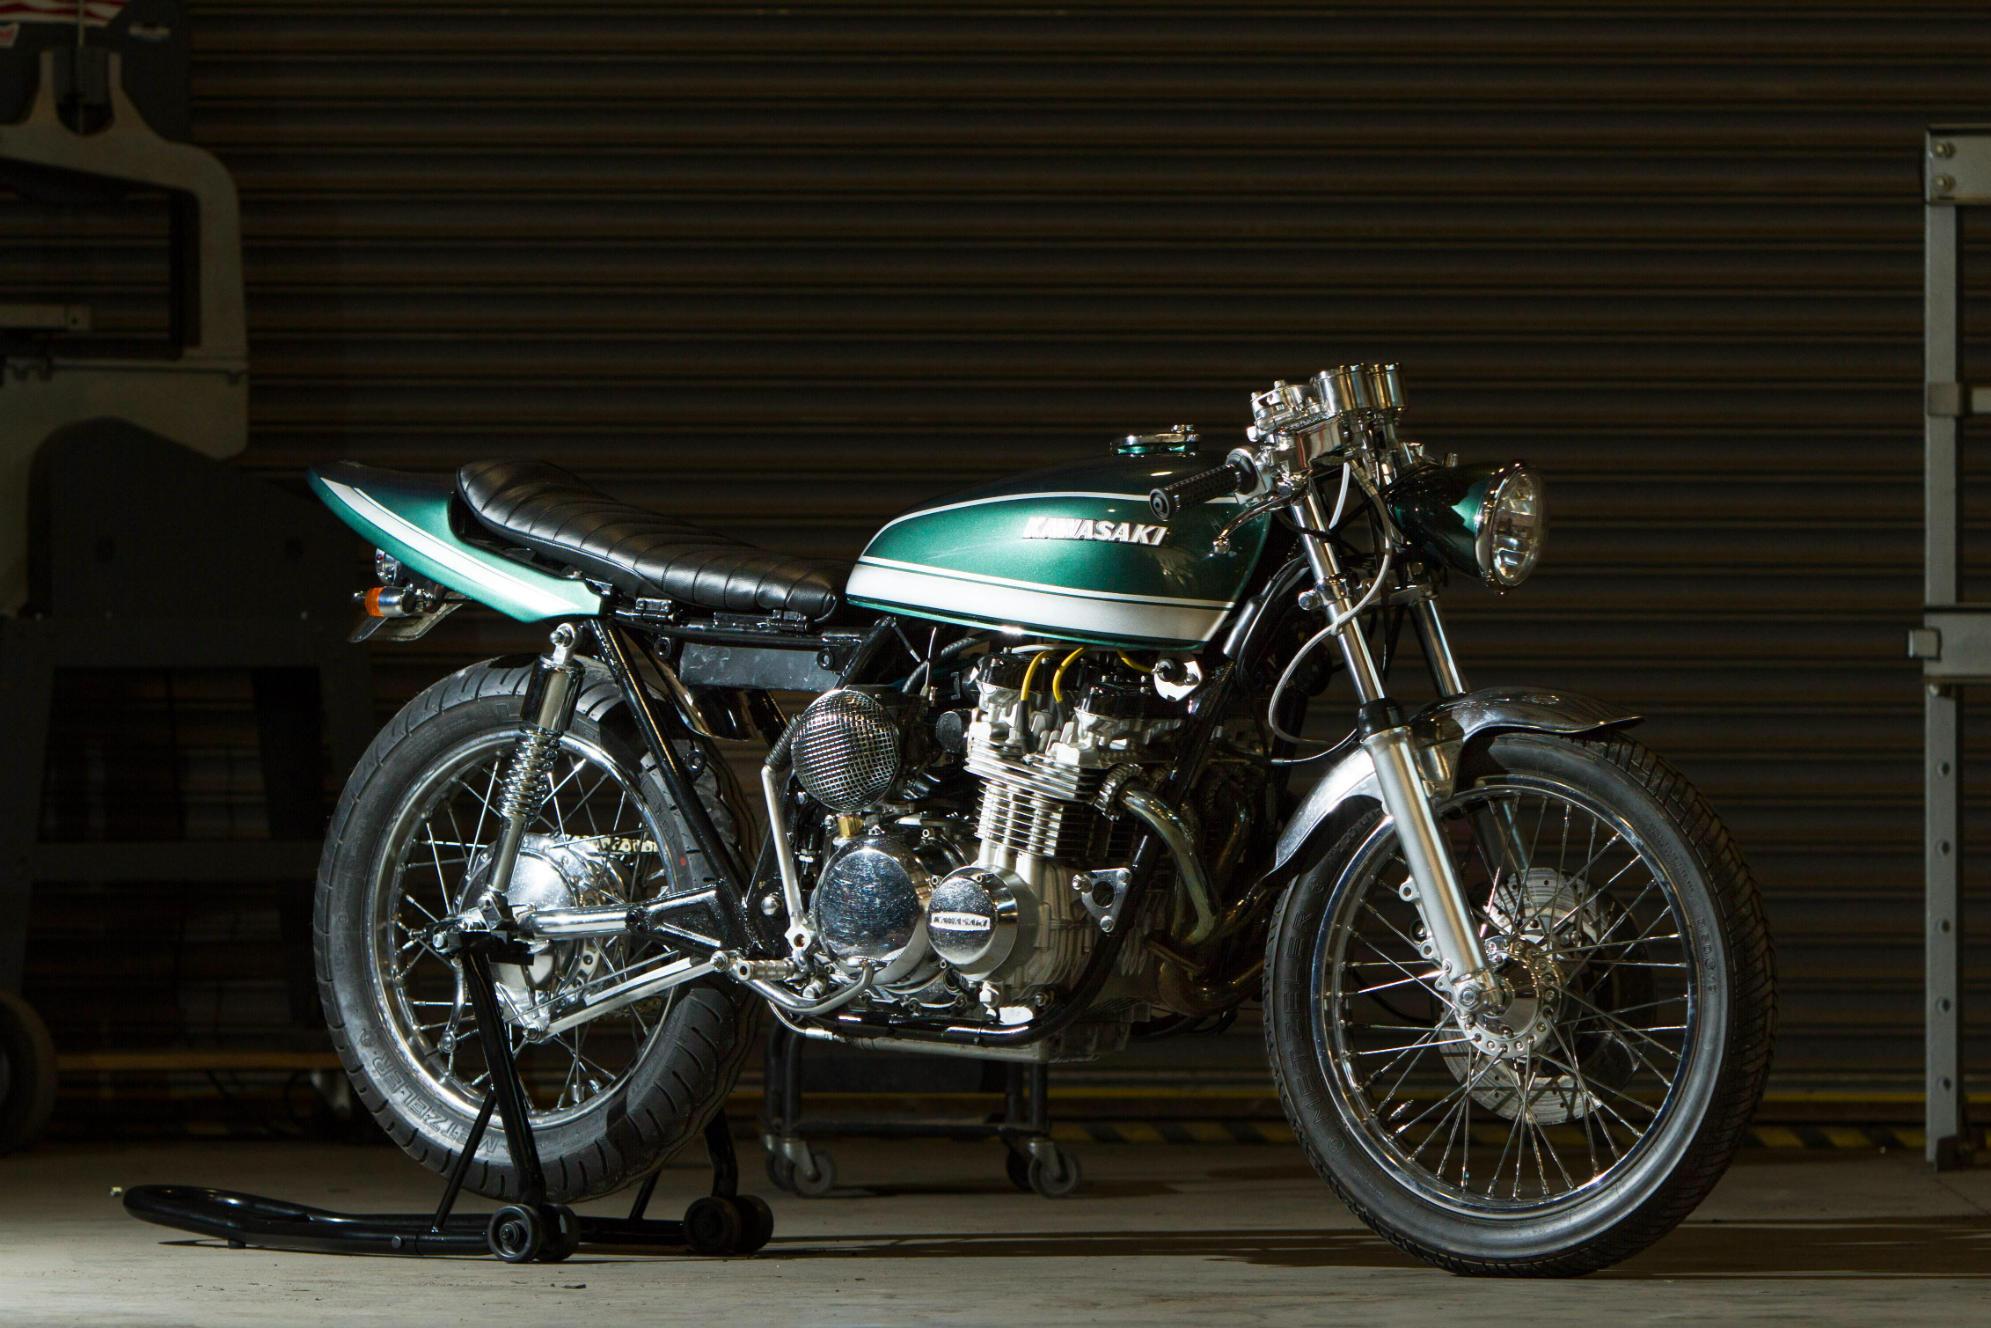 Kawasaki KZ650 Turbocharged